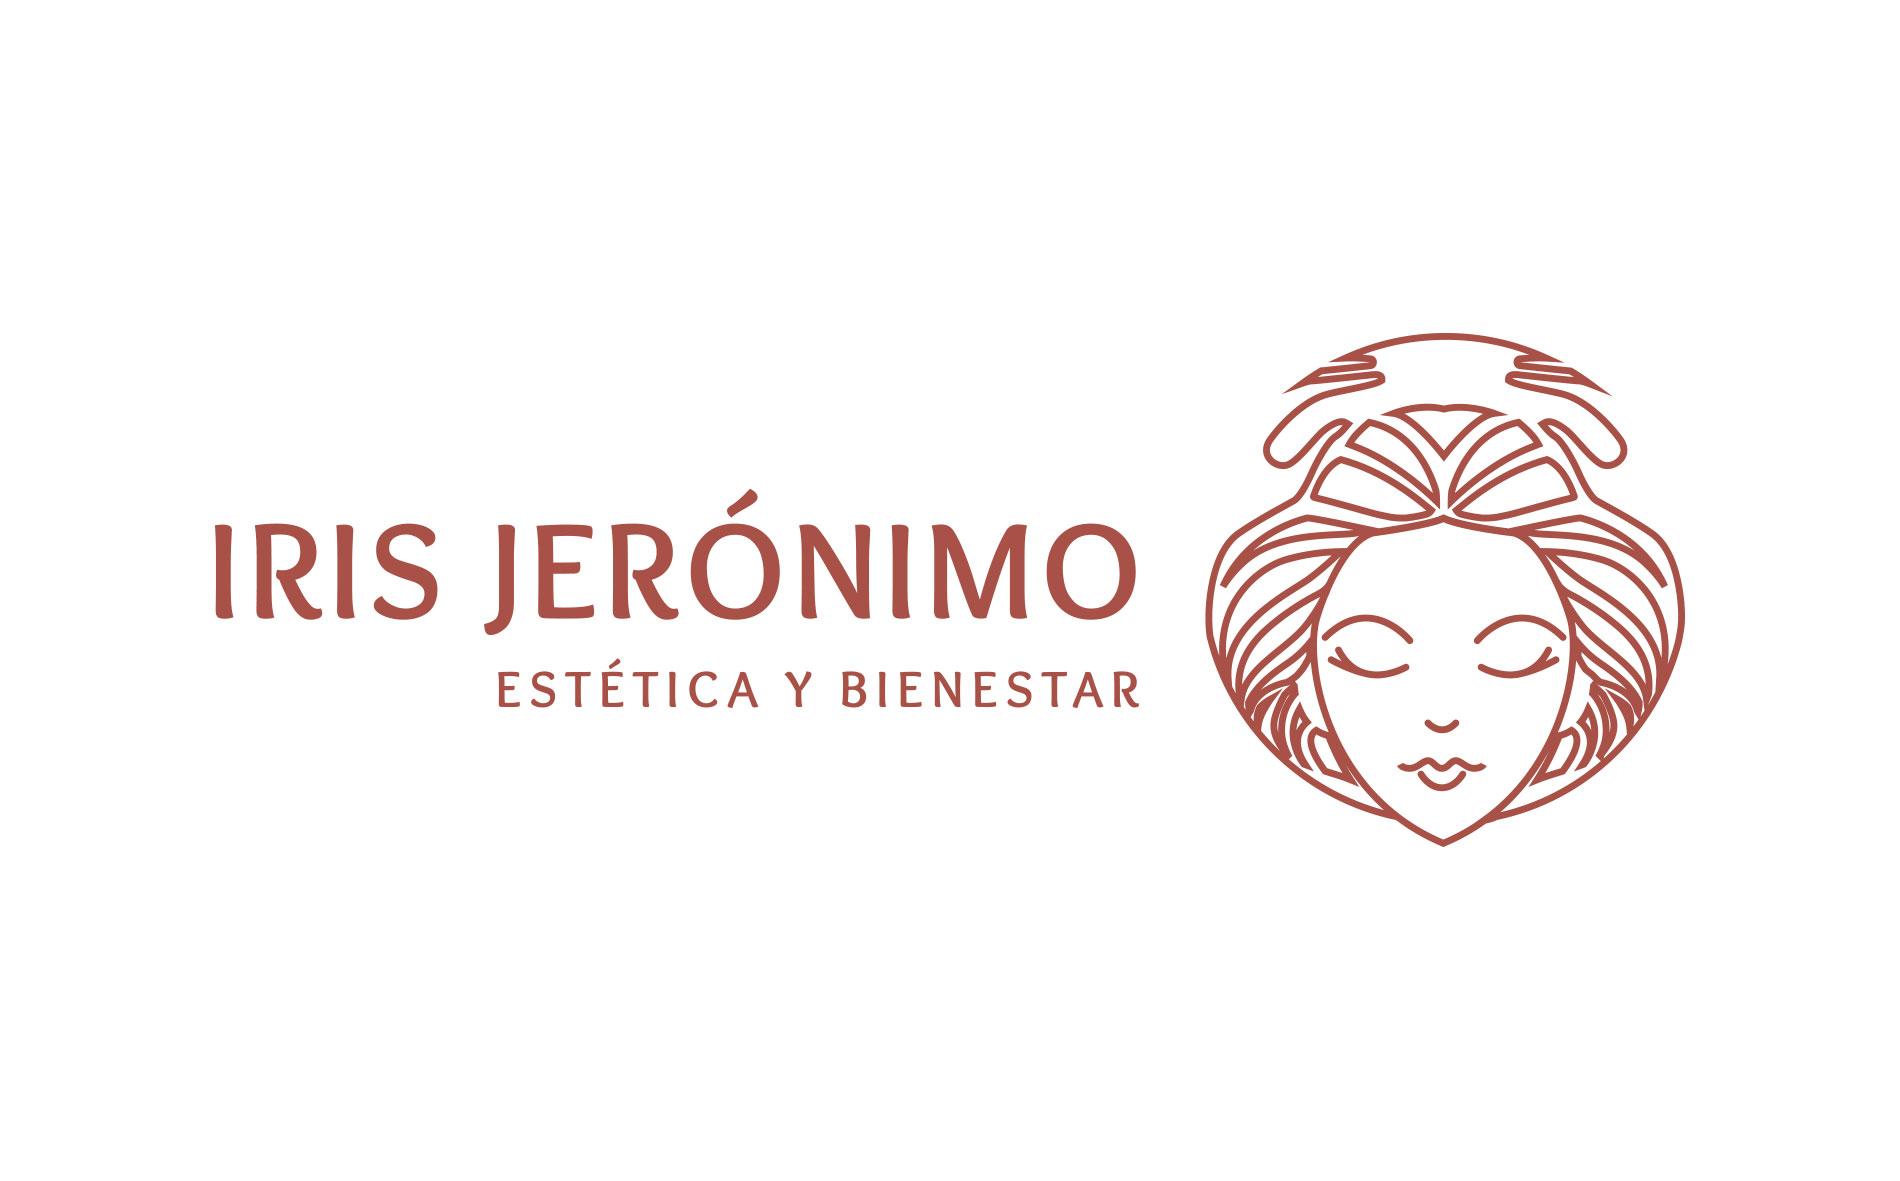 Iris Jerónimo - Diseño de Marca 5